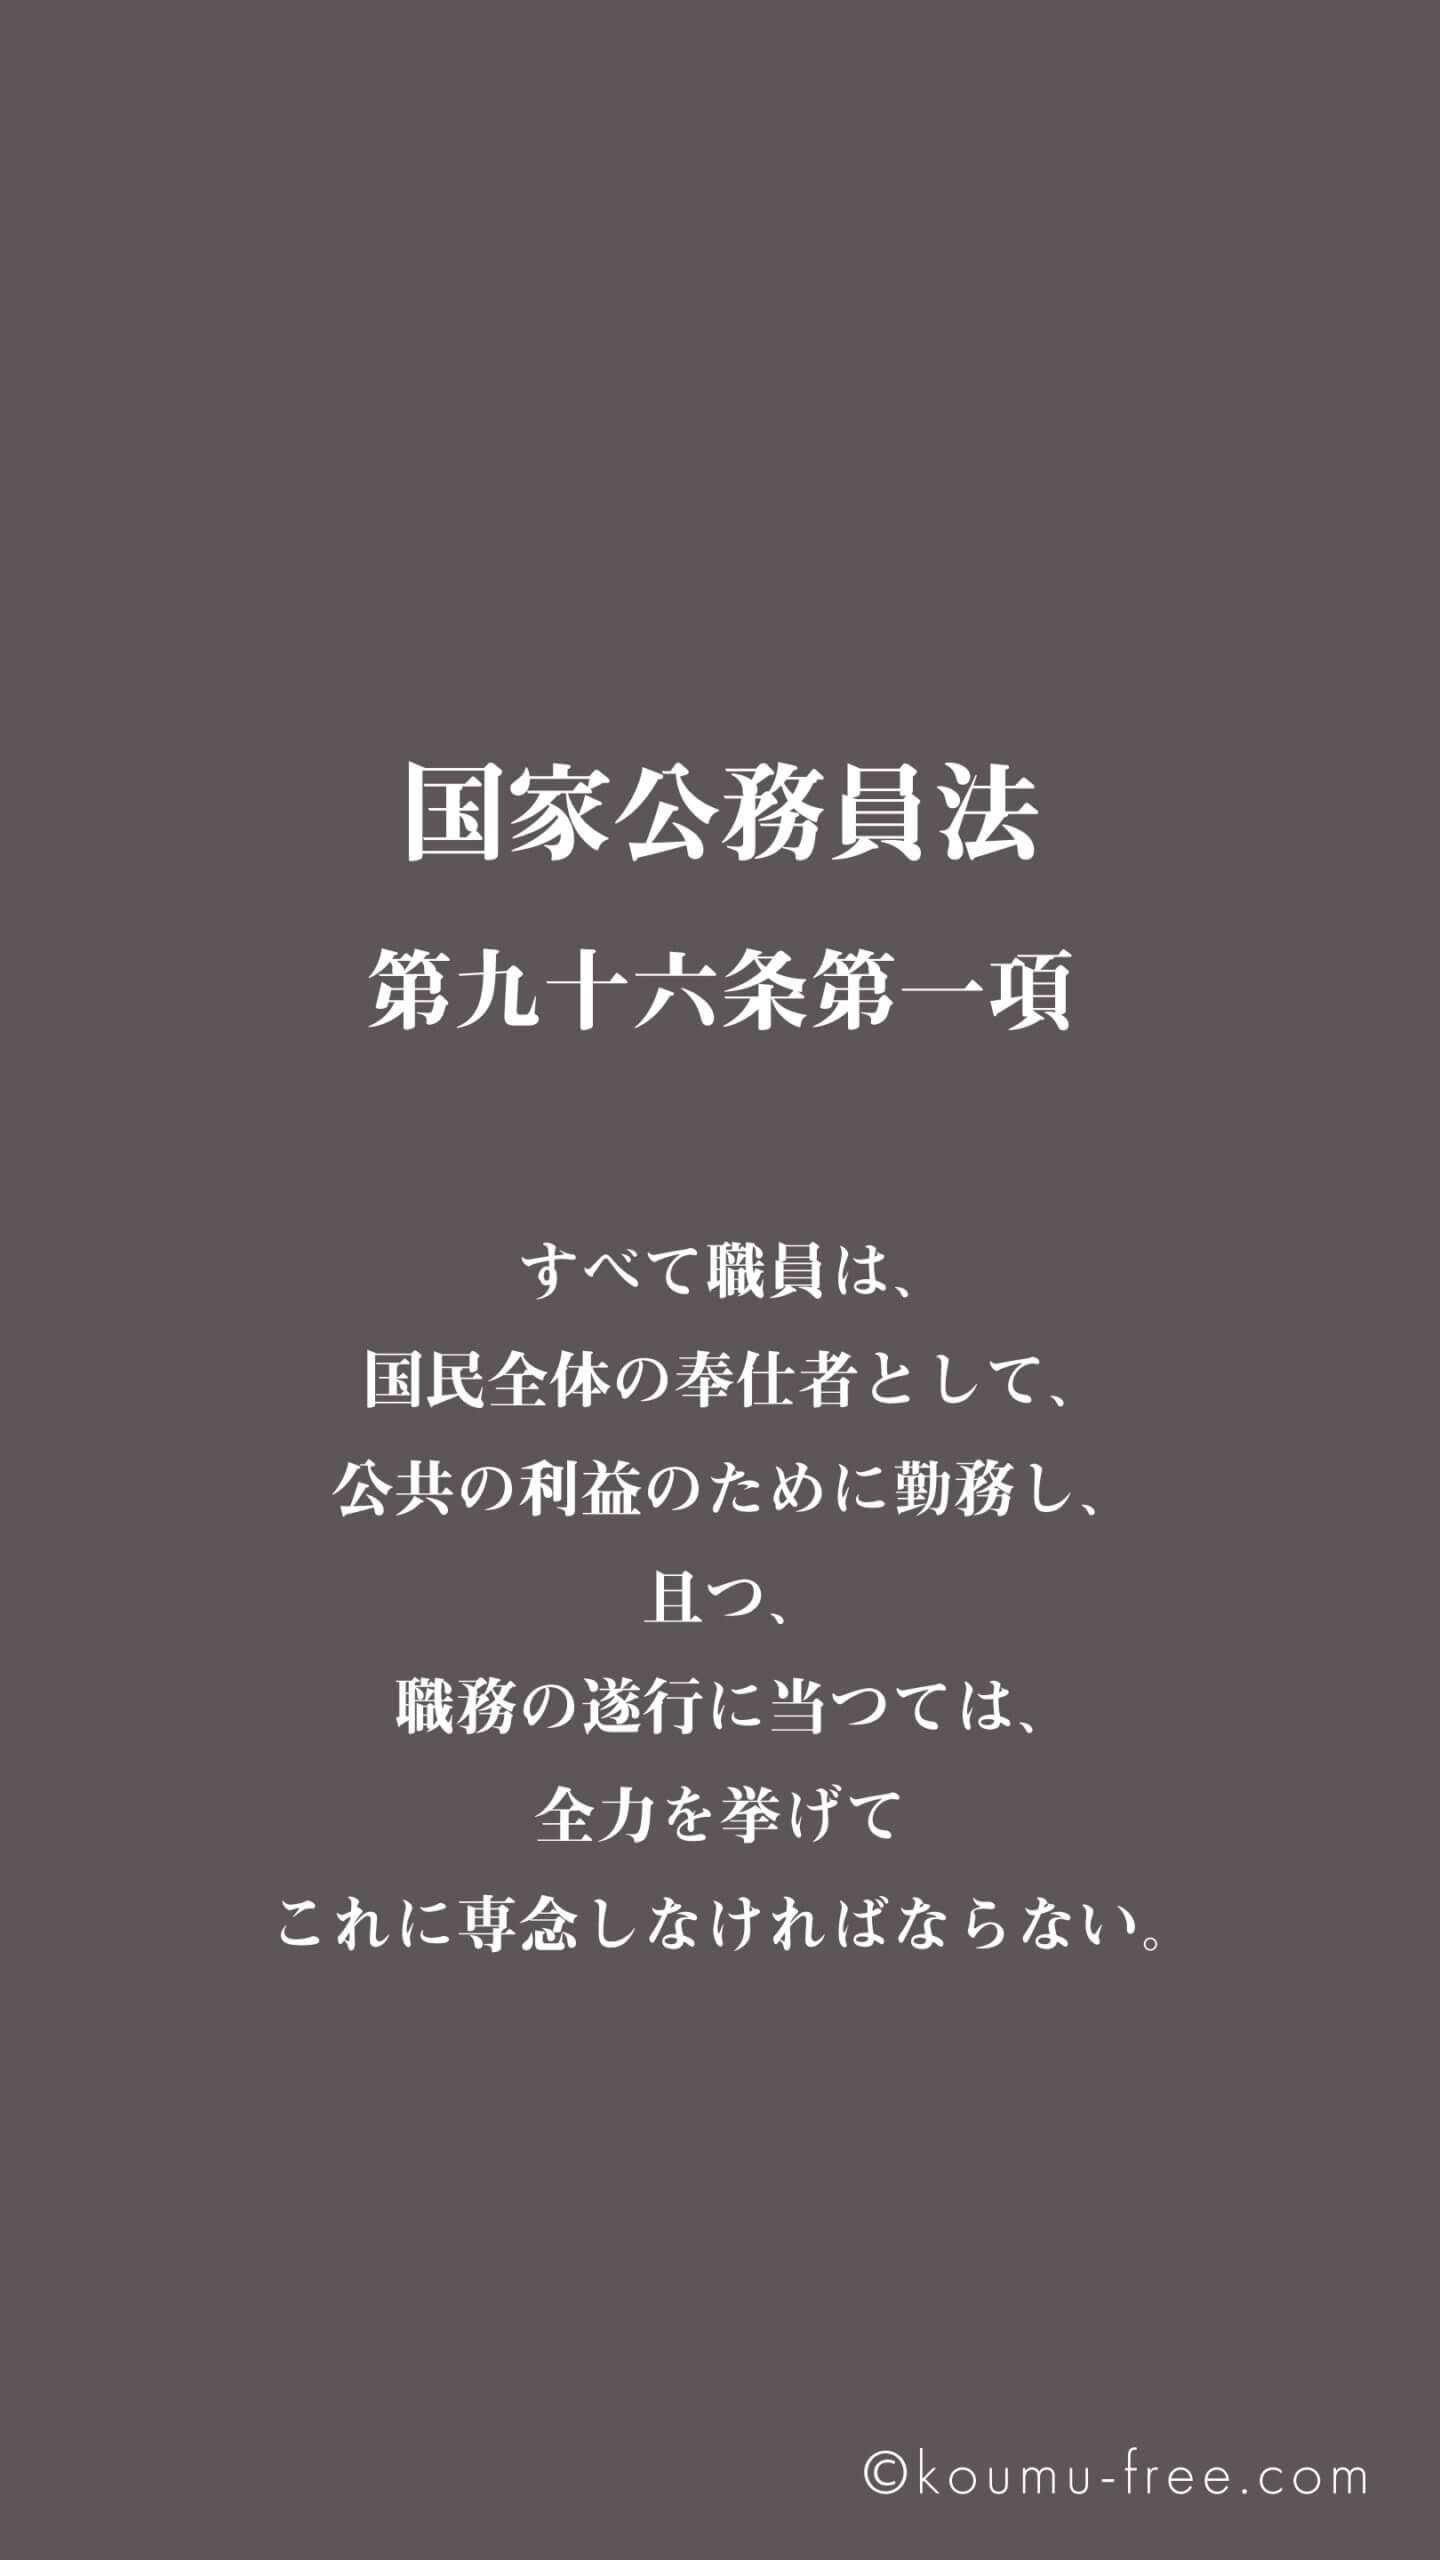 公務員壁紙・待ち受け画像(国家公務員法)